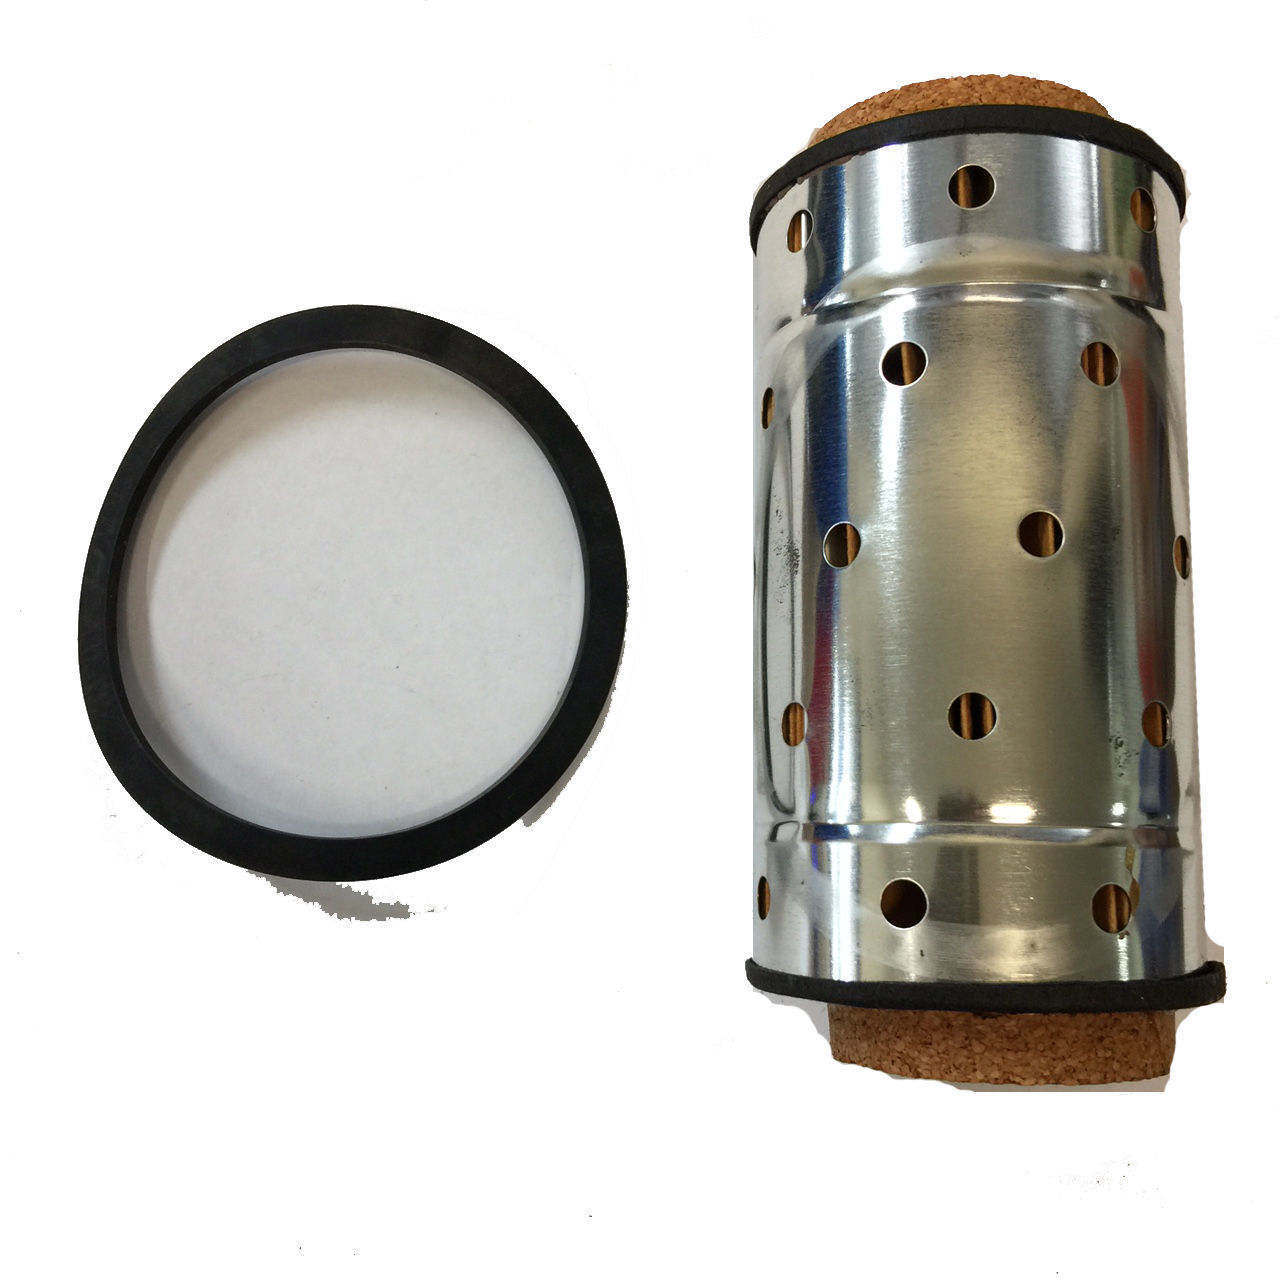 hight resolution of gm diesel 2 53 3 71 4 53 6v 53 6v 71 8v 71 fram primary fuel filter r2106p fram